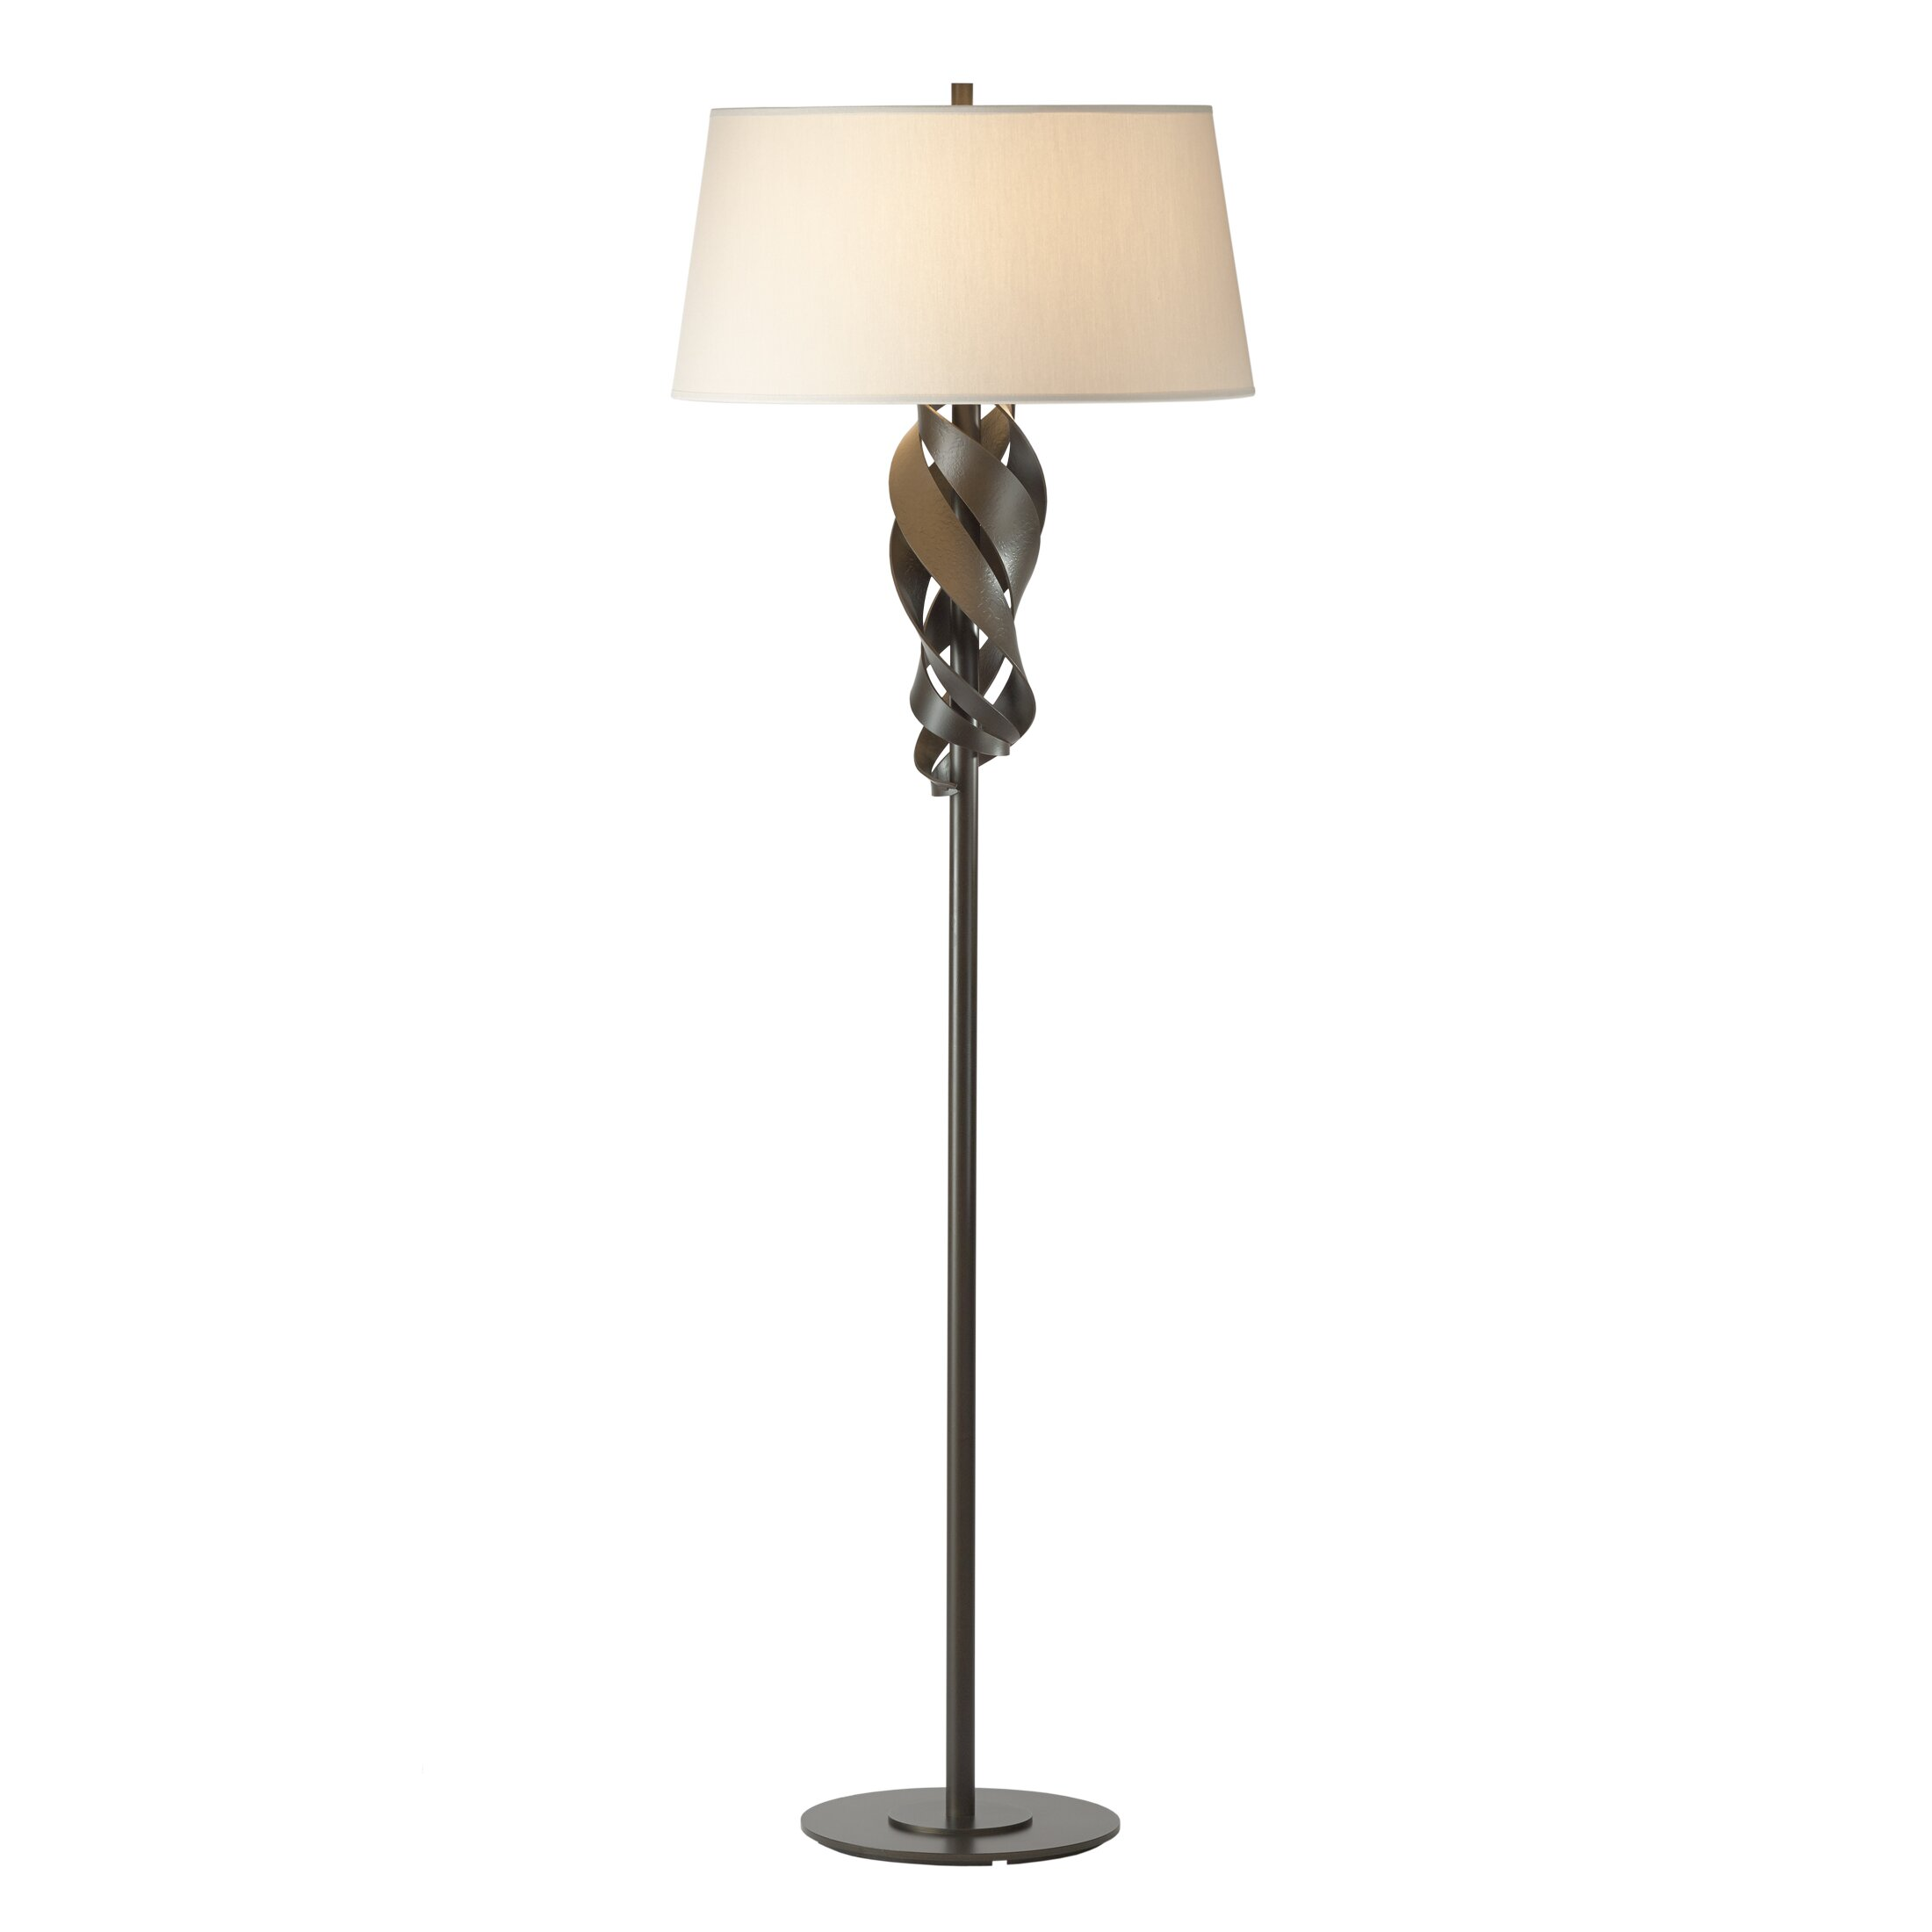 "Hubbardton Forge Lamp Shades: Hubbardton Forge Folio 59.6"" Floor Lamp"